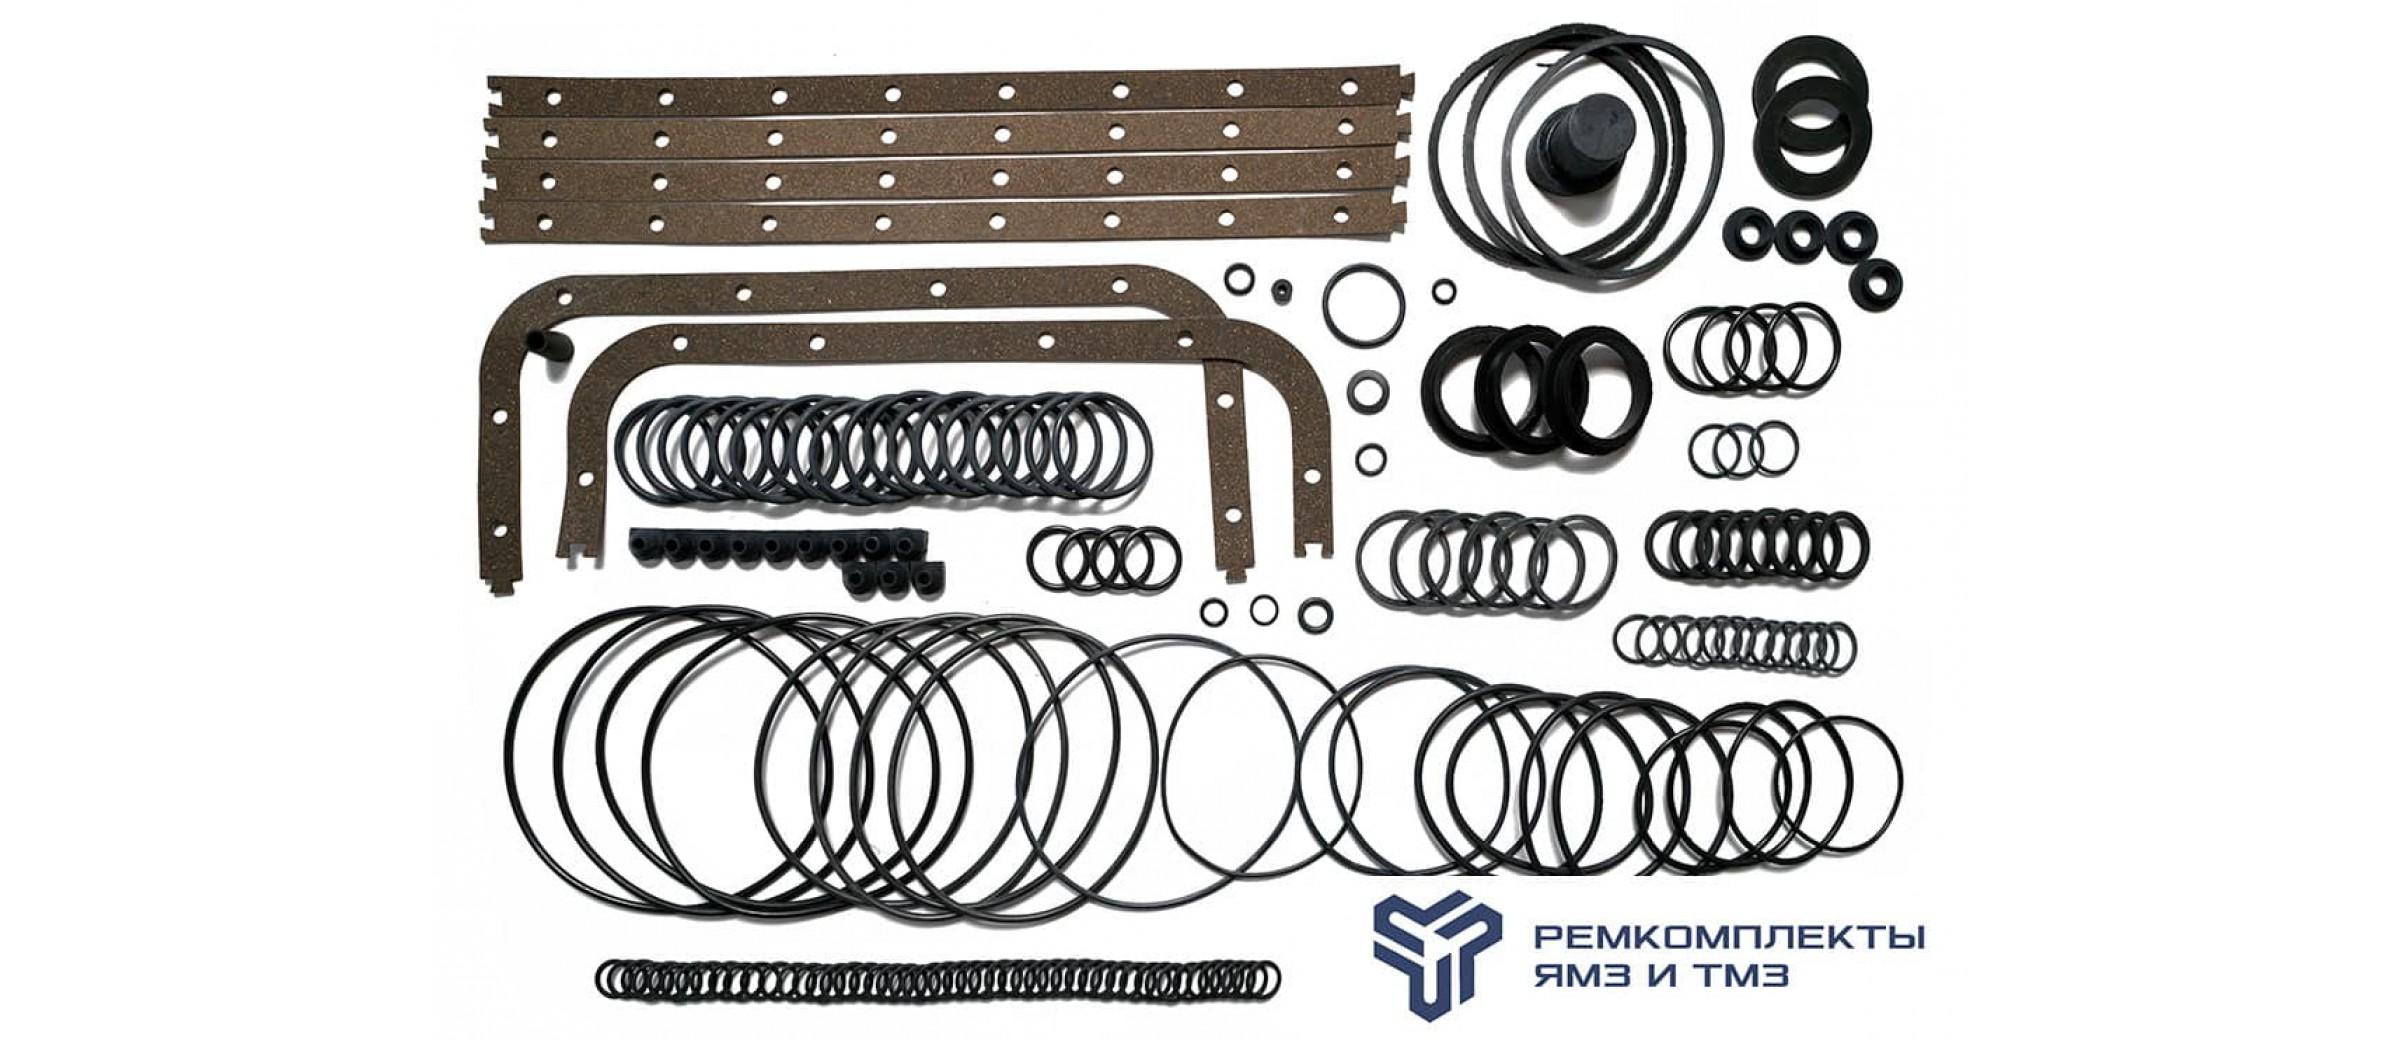 Ремкомплект РТИ на двигатель ЯМЗ-8401 (без Г/П, ГБЦ)